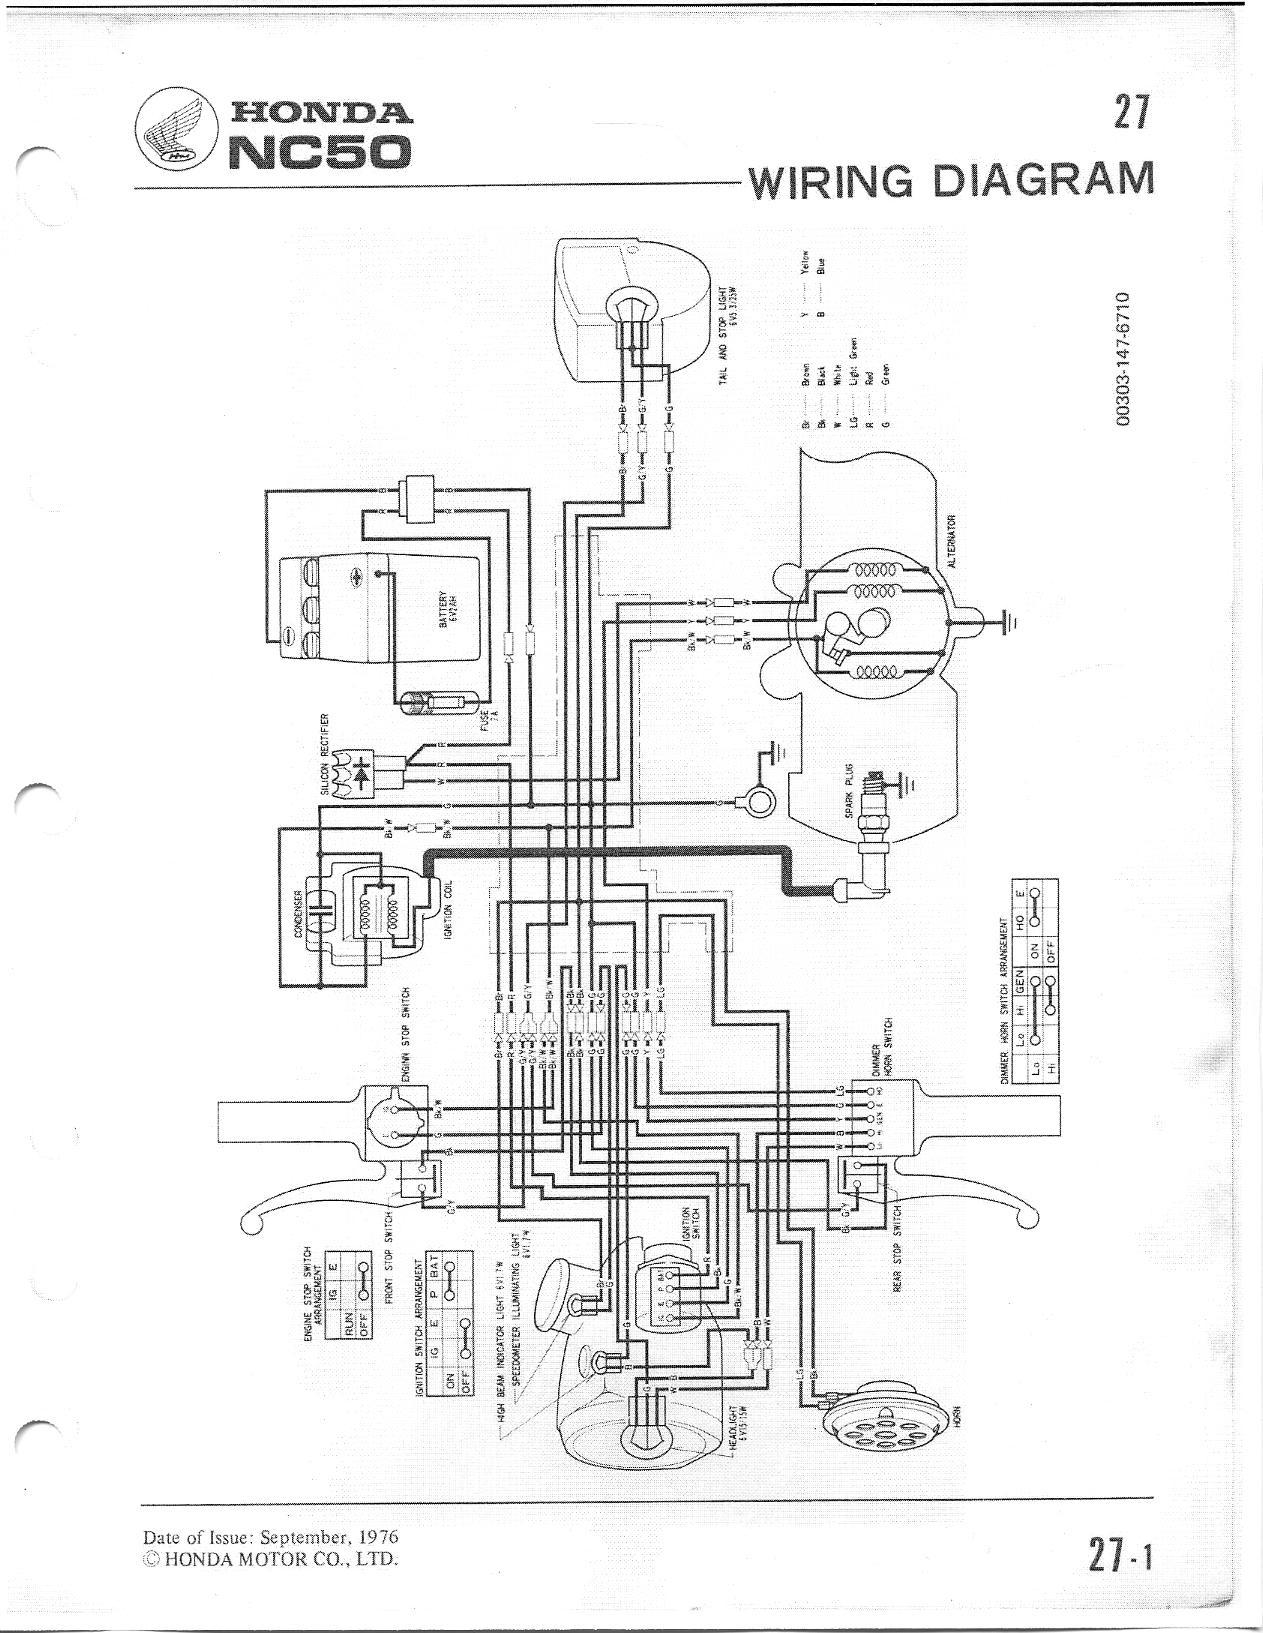 2012 bashan 49cc wiring diagram